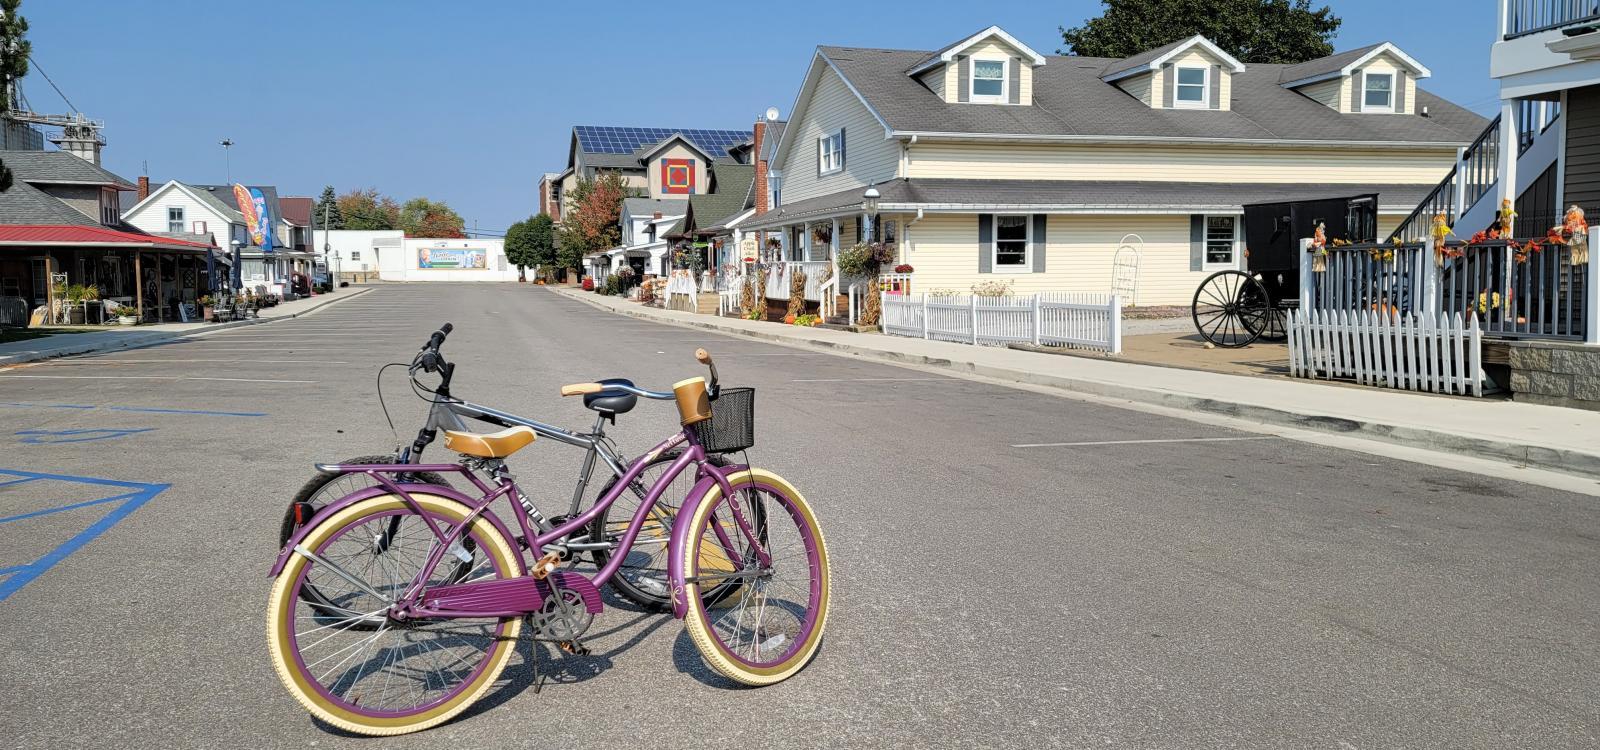 Bicycling on the Pumpkin Vine & through town